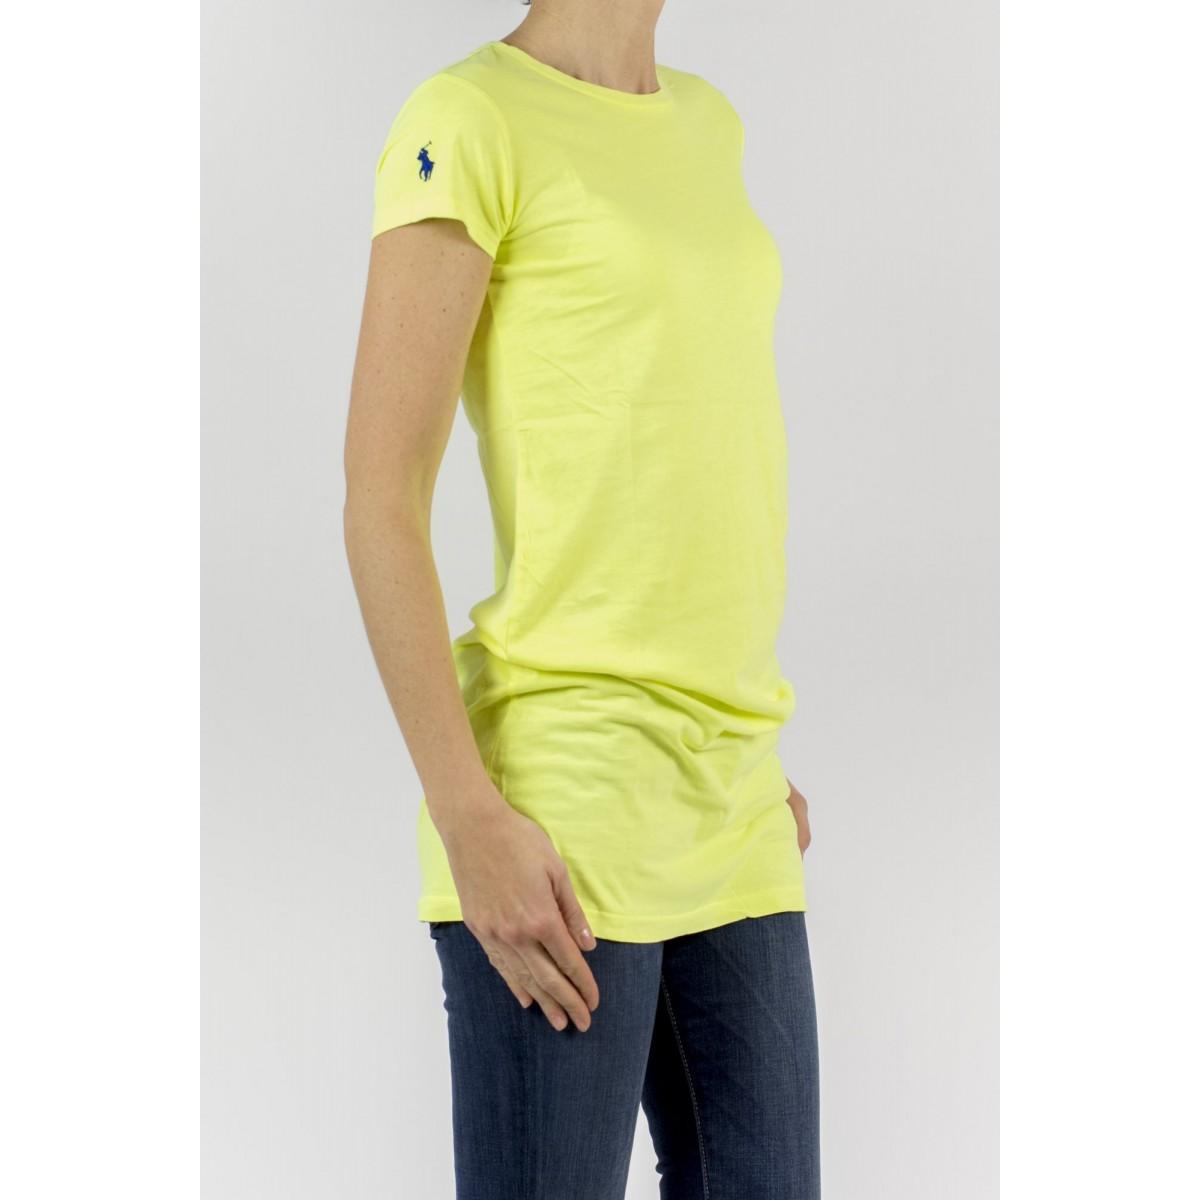 T-Shirt Ralph Lauren Frauen- V38Iccrtc8410 B7418 - giallo